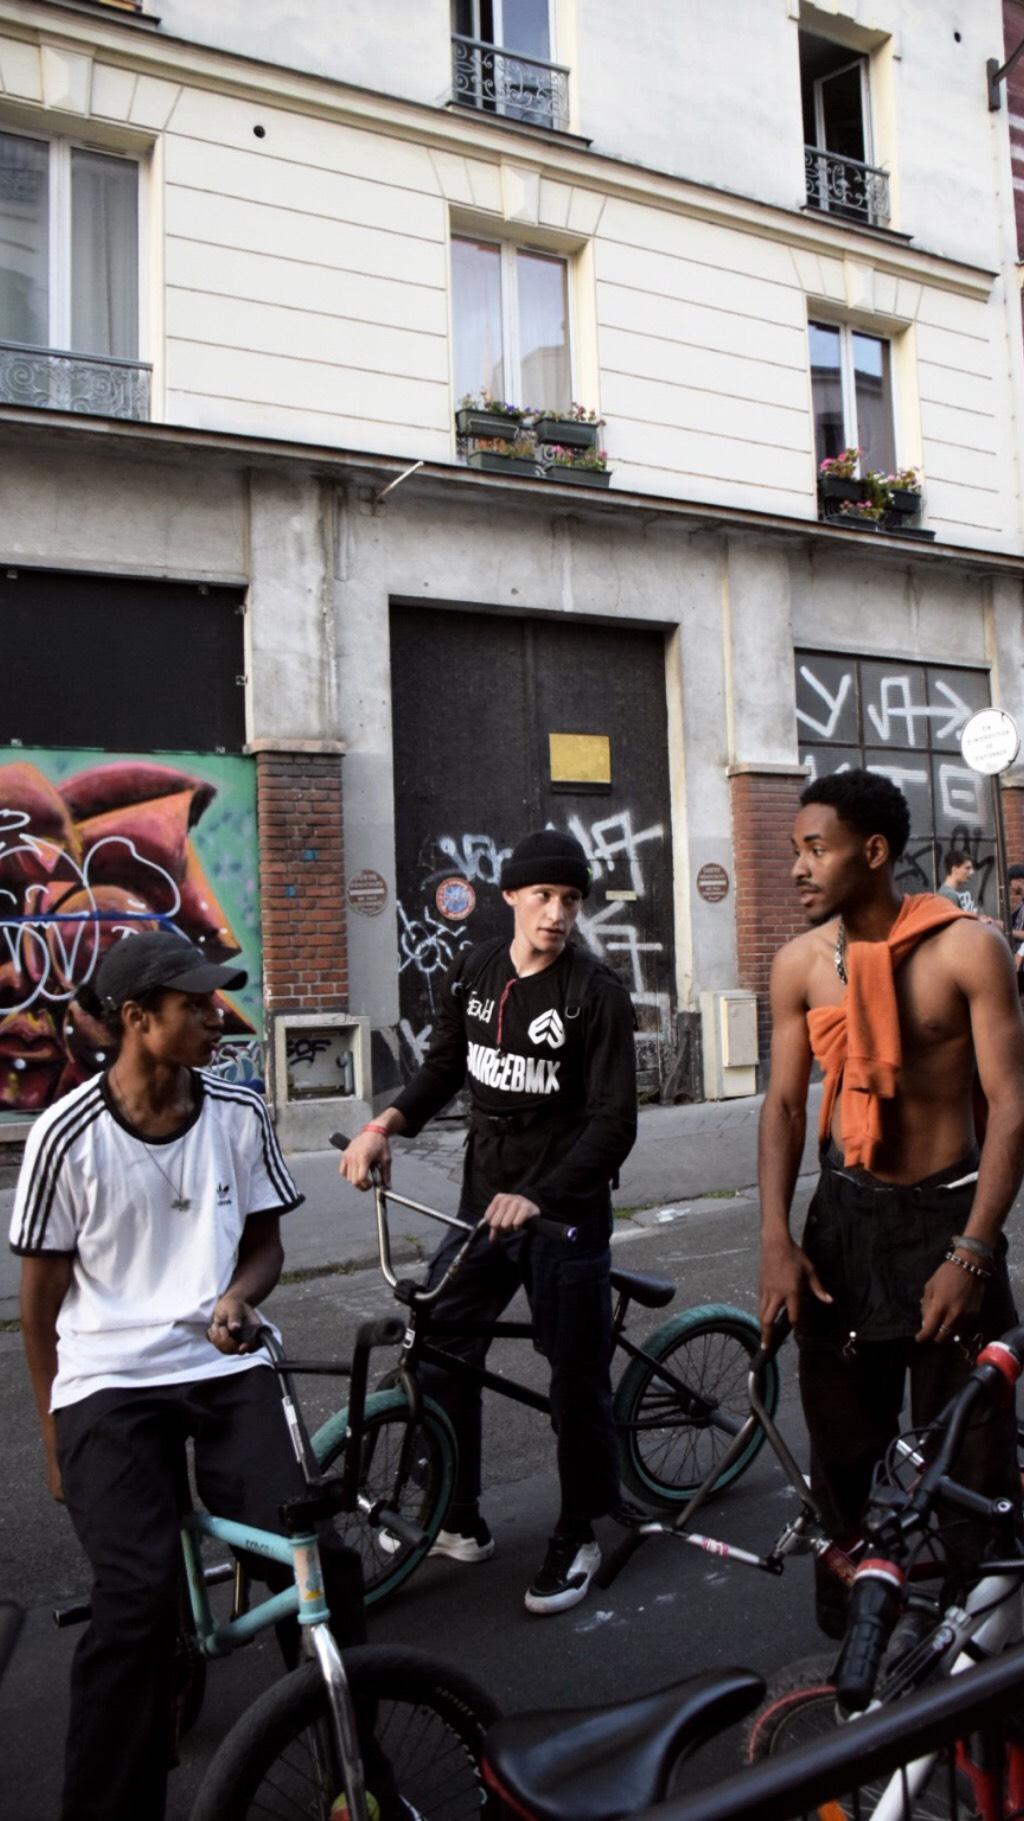 Superbe_media_urbain_paris_lifestyle_france_performance_bmx-13